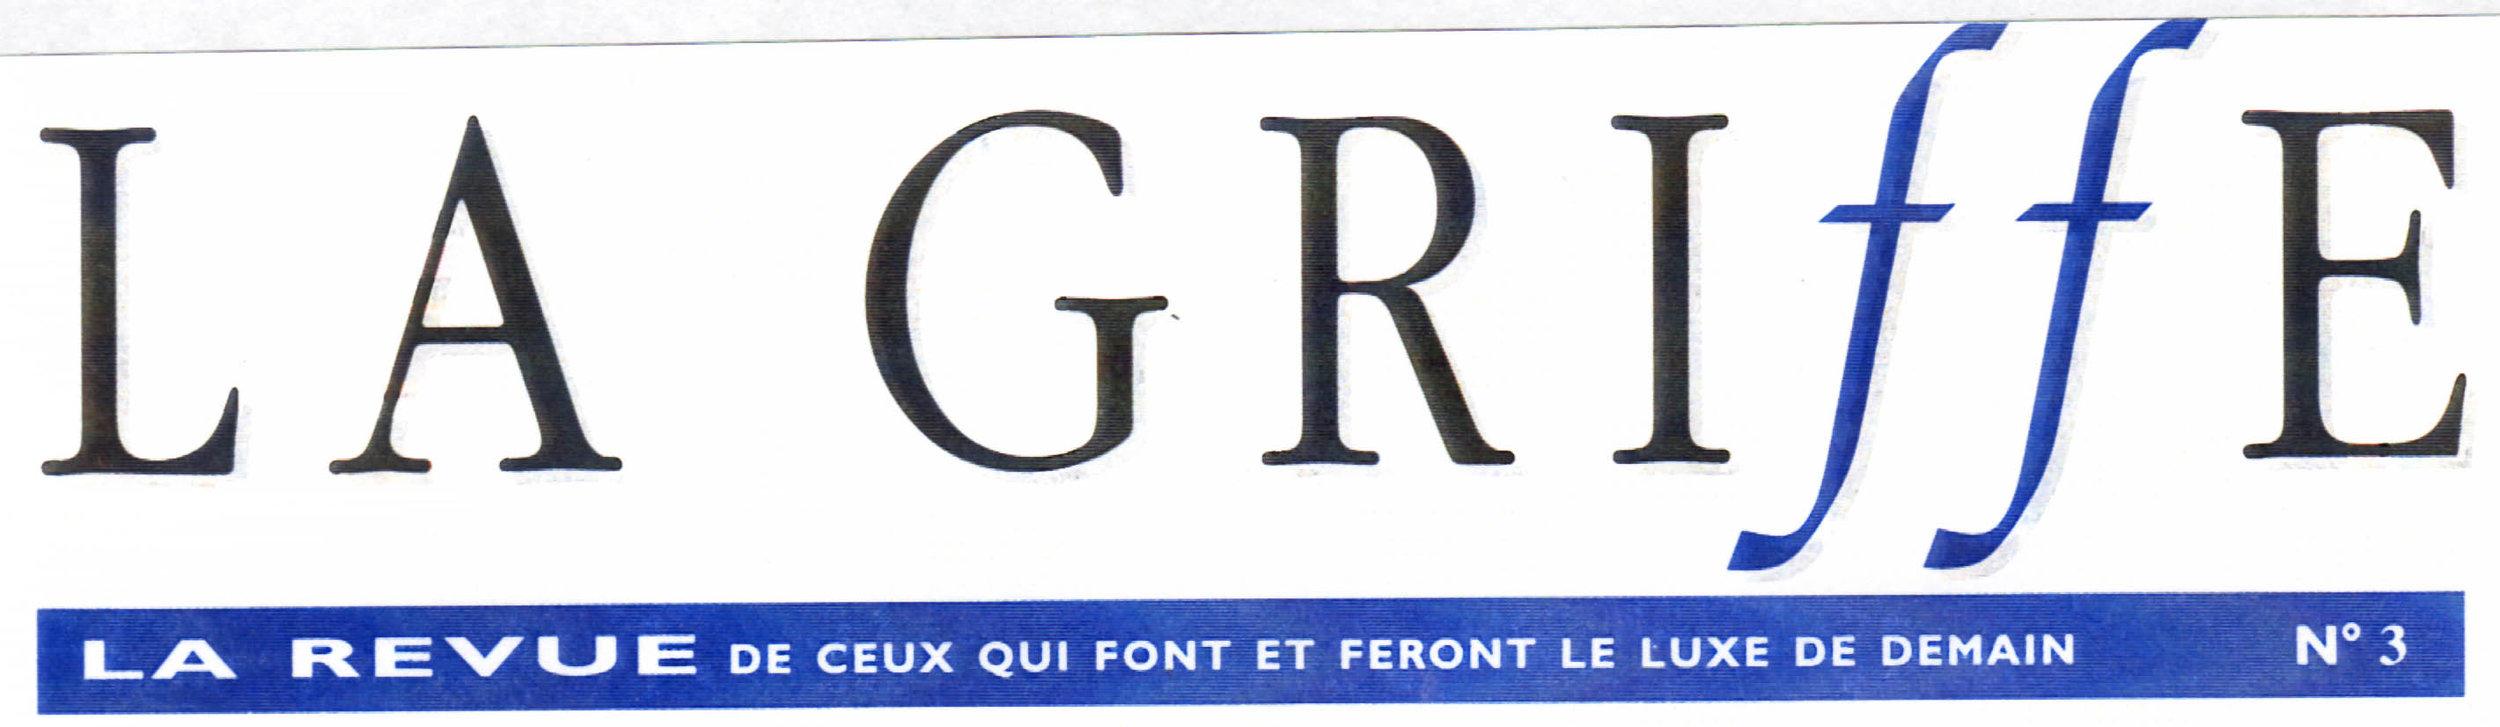 LaGriffe-Janv95-entête.jpg